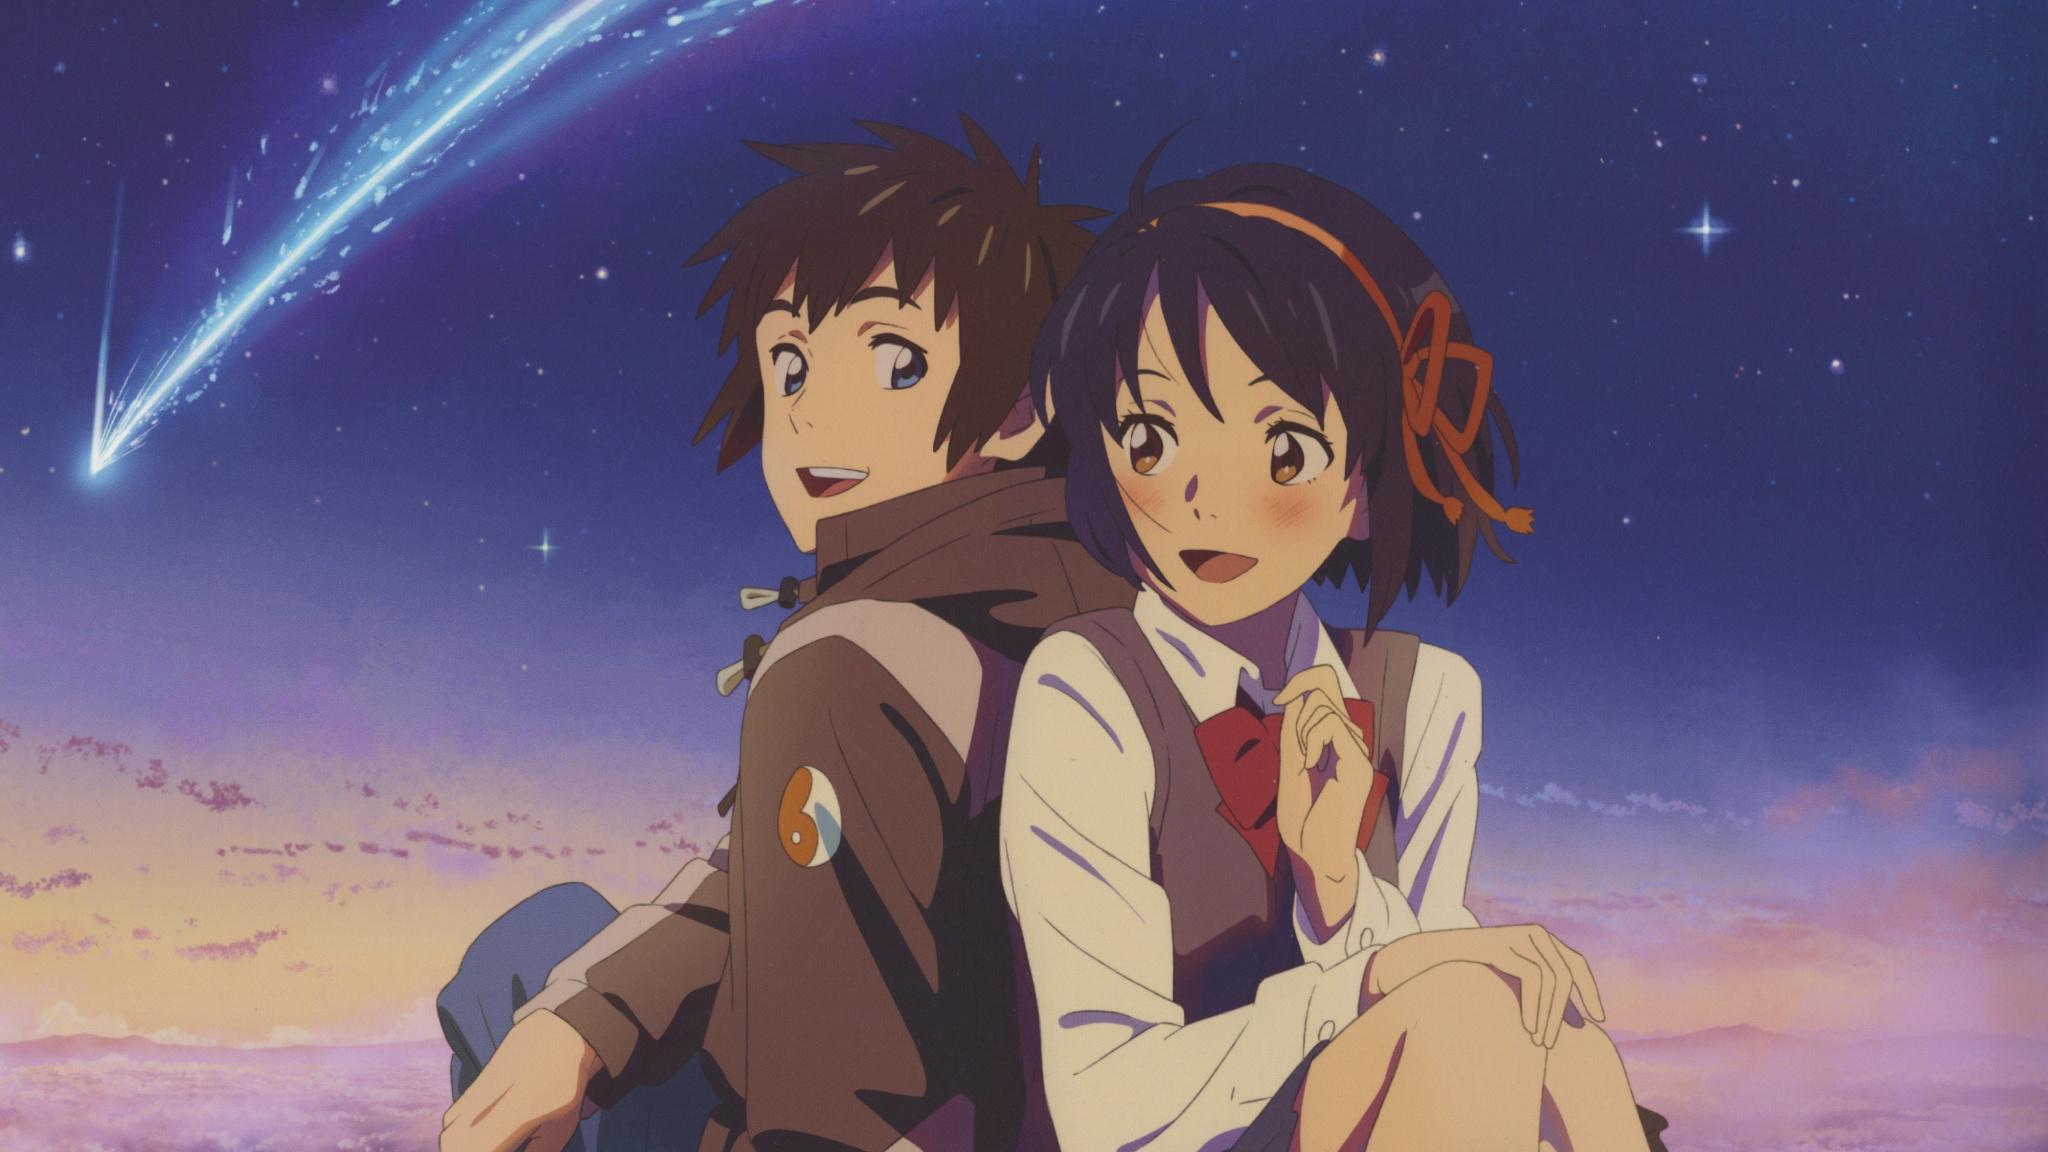 Cute Couple, Mitsuha Miyamizu, Taki Tachibana, Kimi - Your Name Mitsuha And Taki , HD Wallpaper & Backgrounds